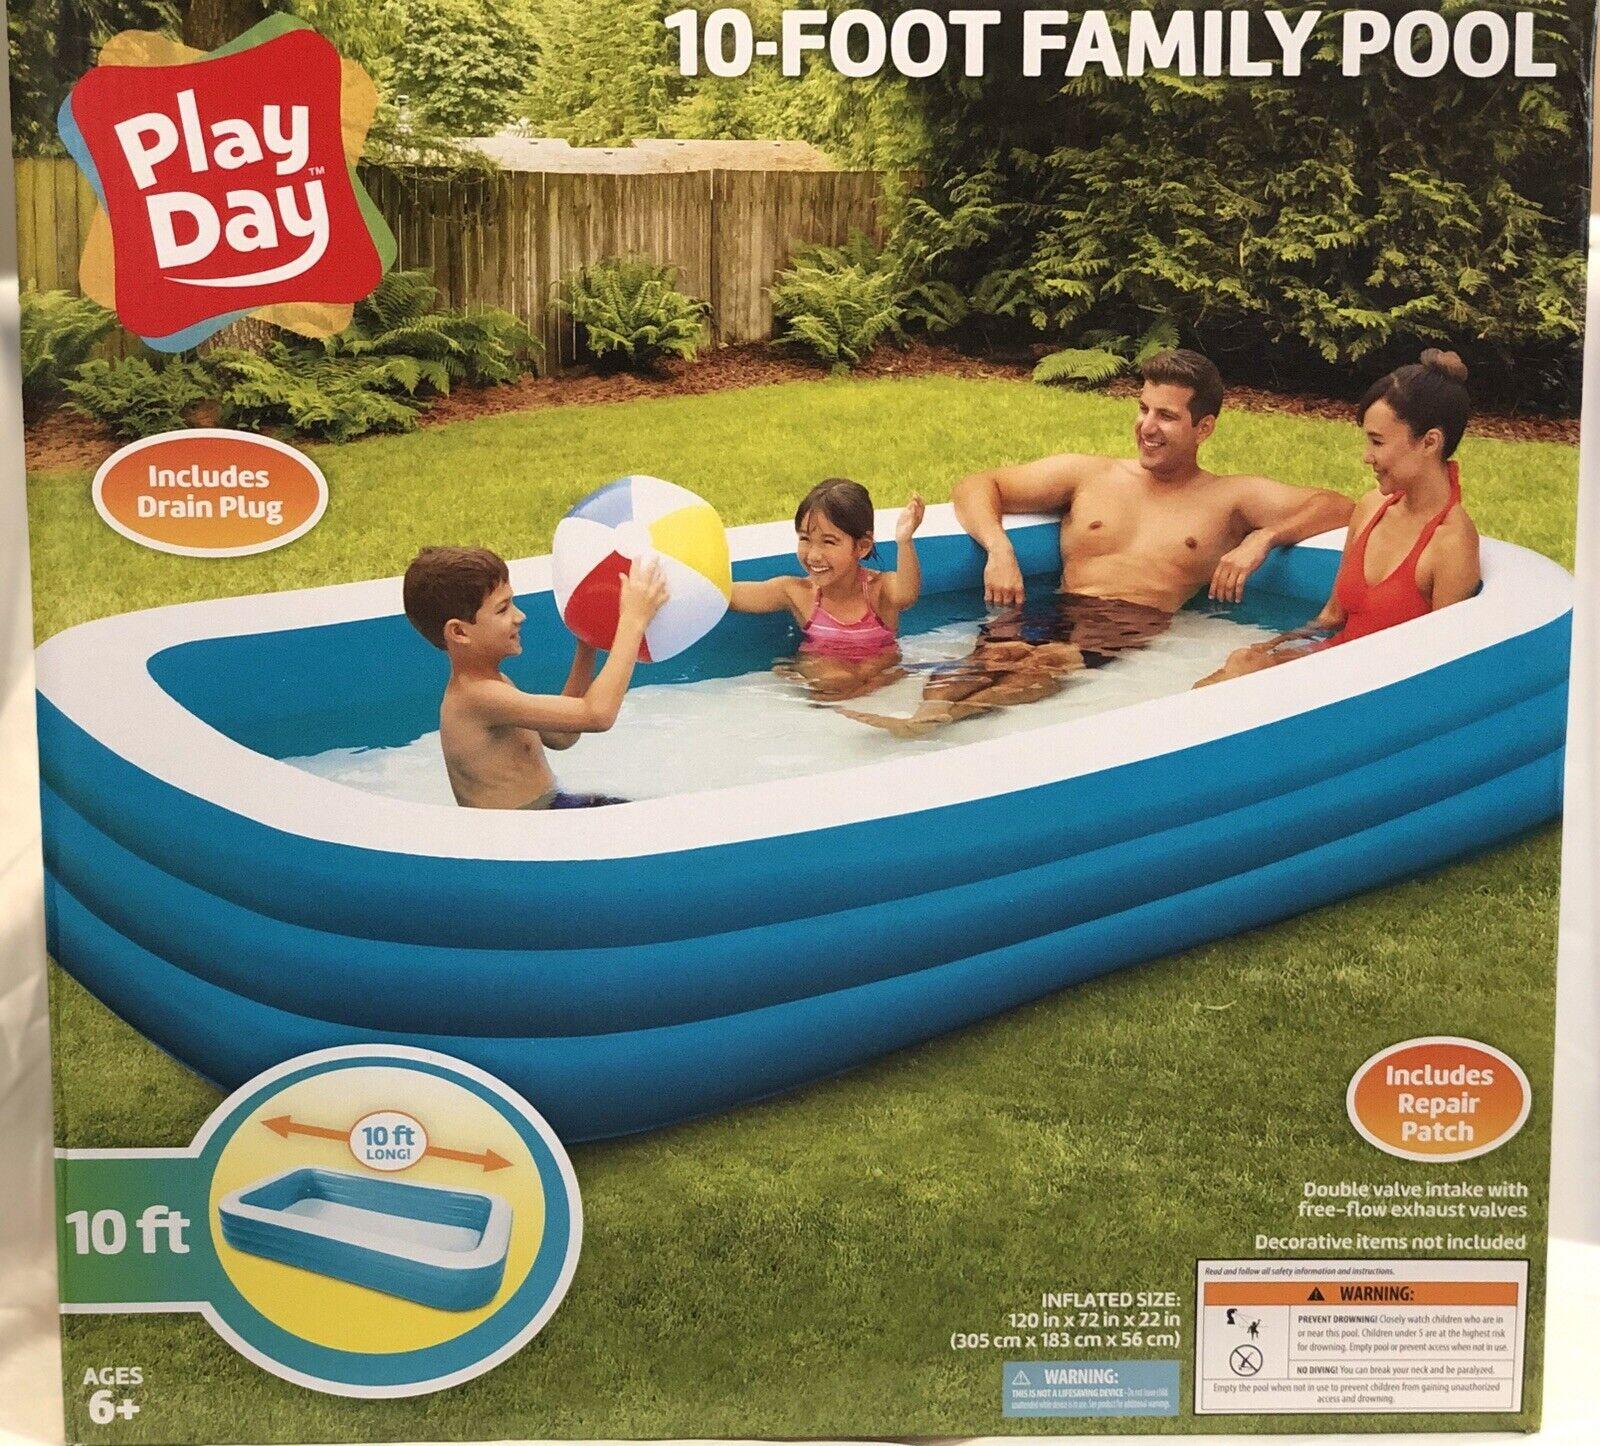 "79 x 59 x 20/"" Rectangular Kiddie Pool Deluxe Inflatable Backyard Kiddie Splash Pool for Ages 3+ Inflatable Family Pool"